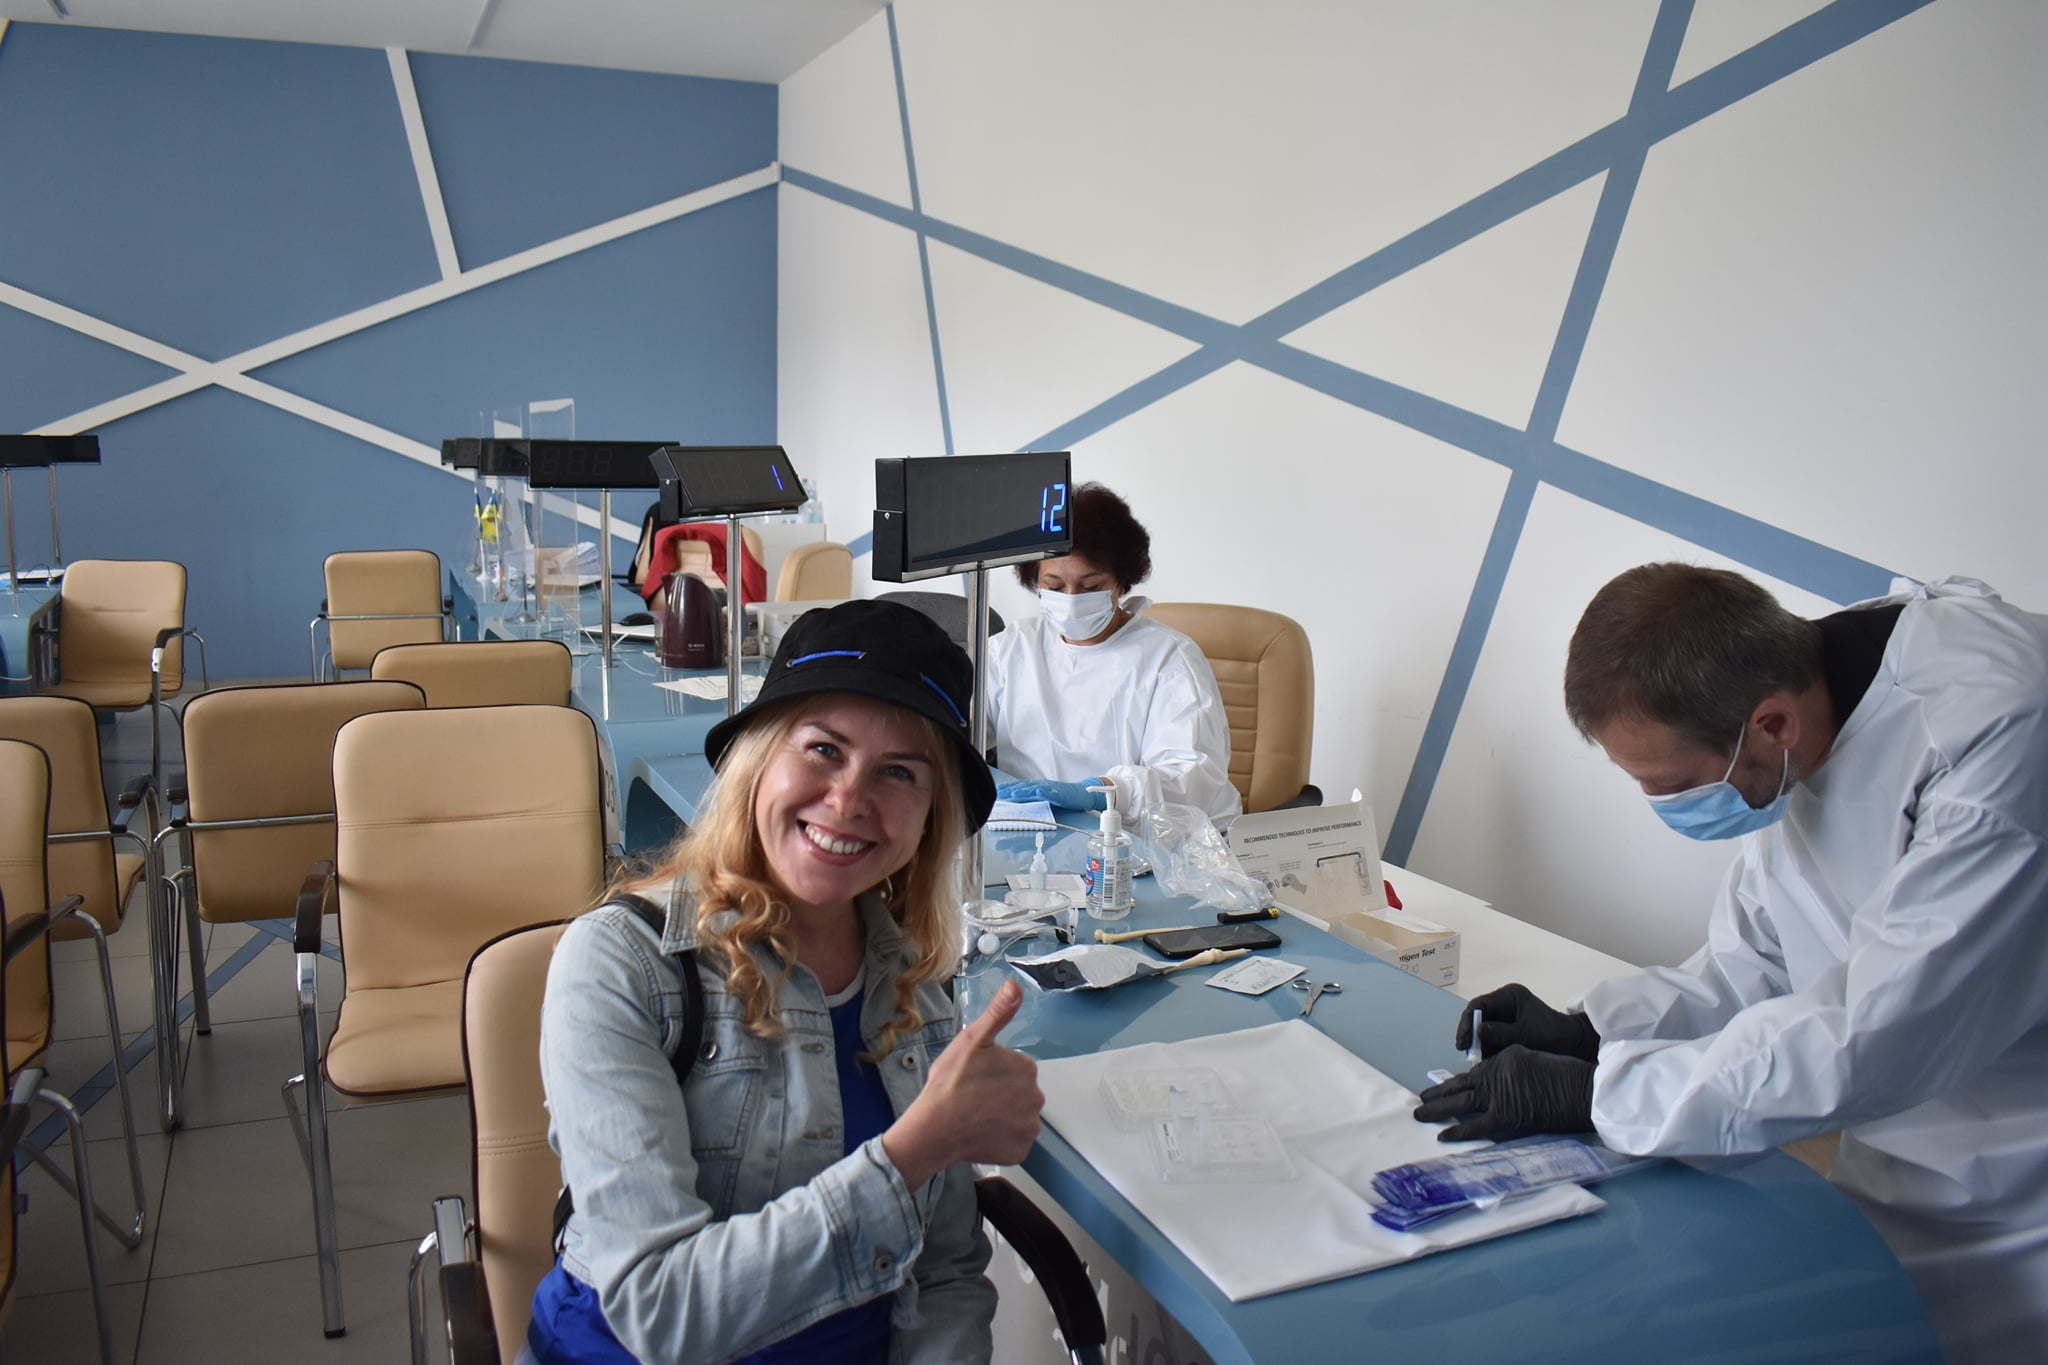 Сергій Тимофєєв, Ірина Коляденко, Тетяна Щербак. фото